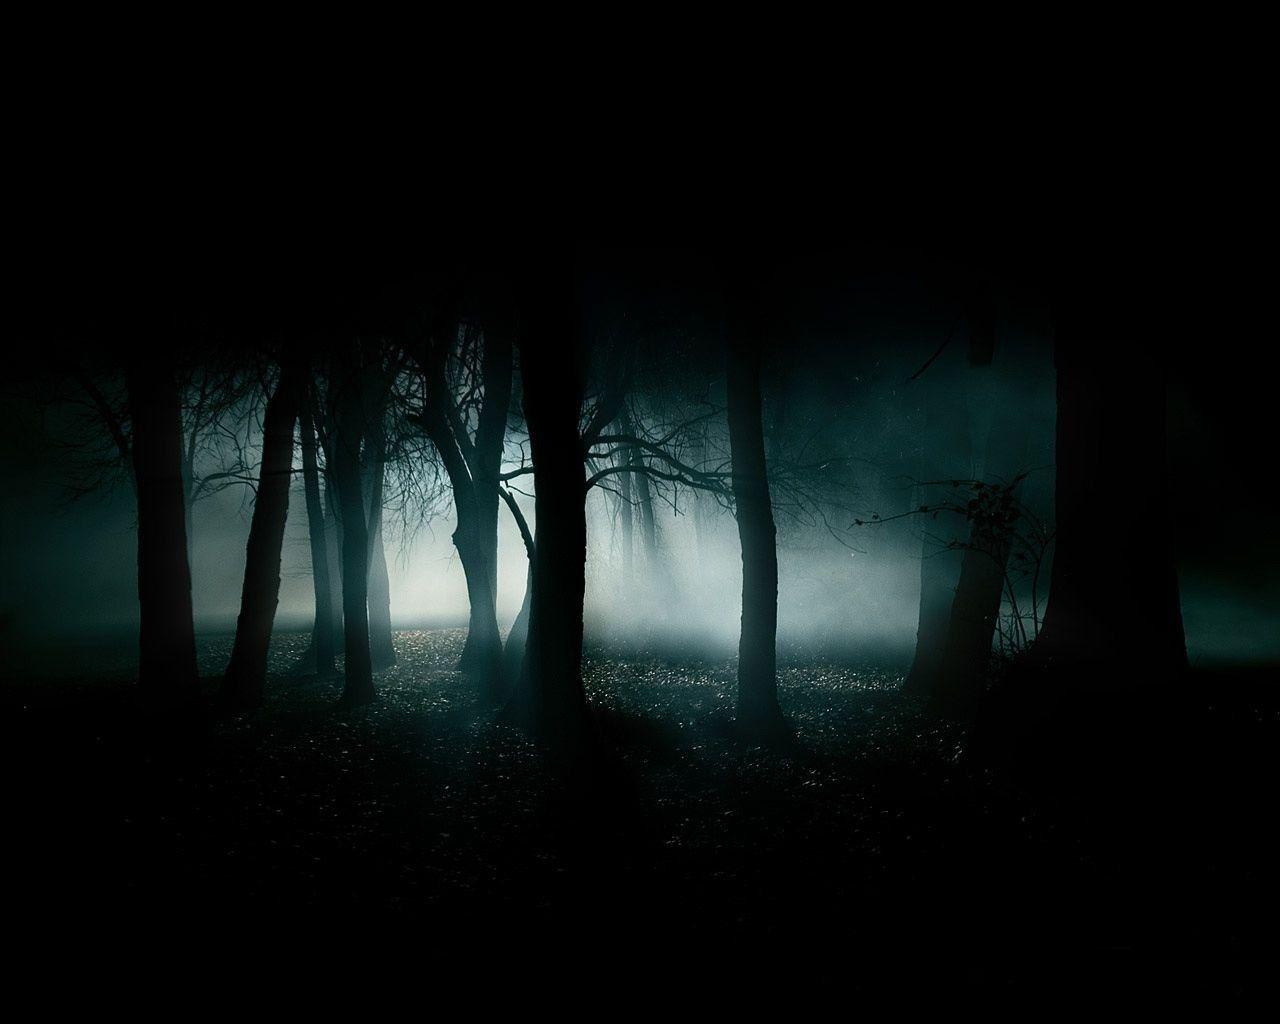 ава темная: